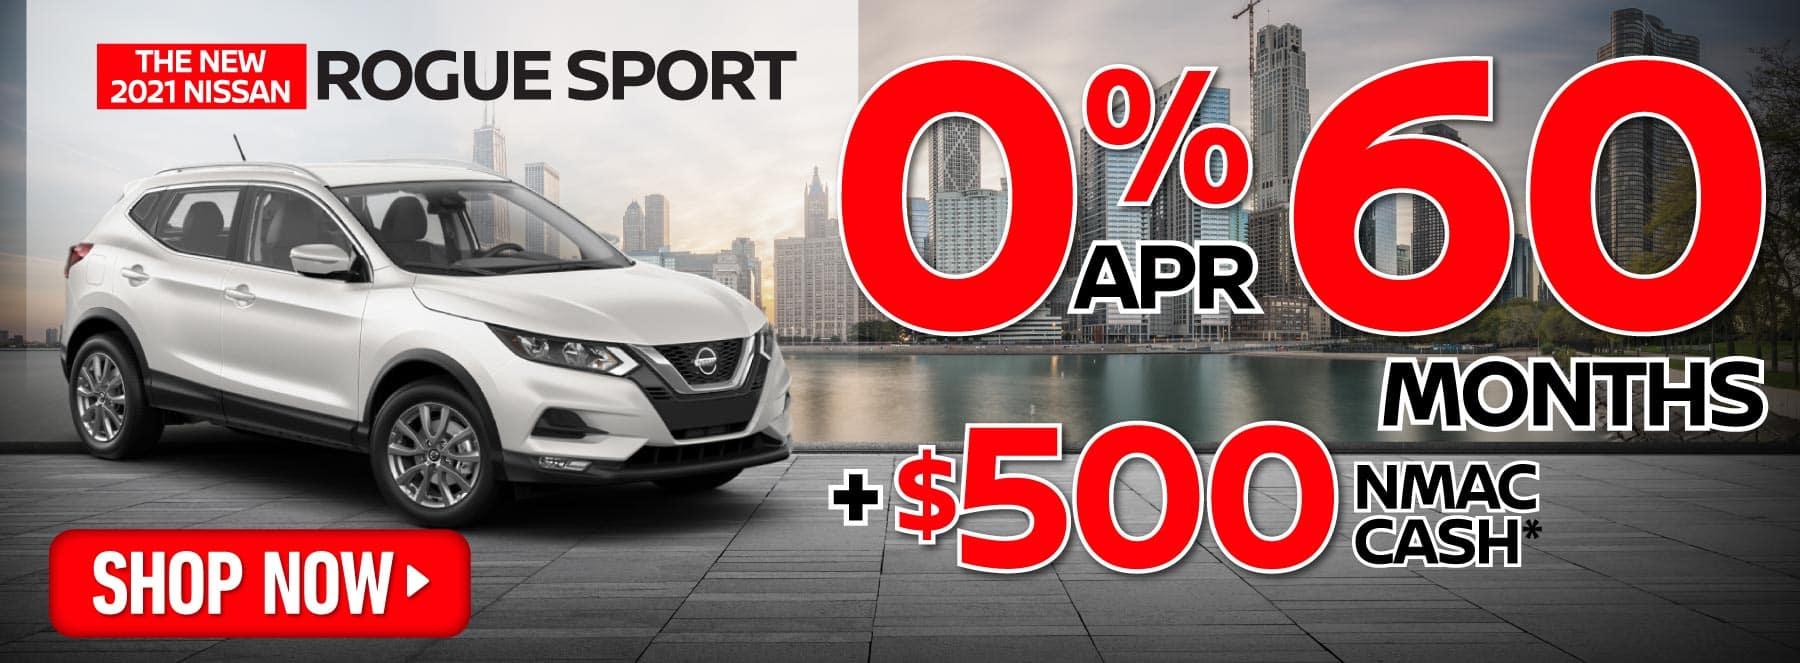 Rogue Sport 0% apr for 60 months | Shop Now